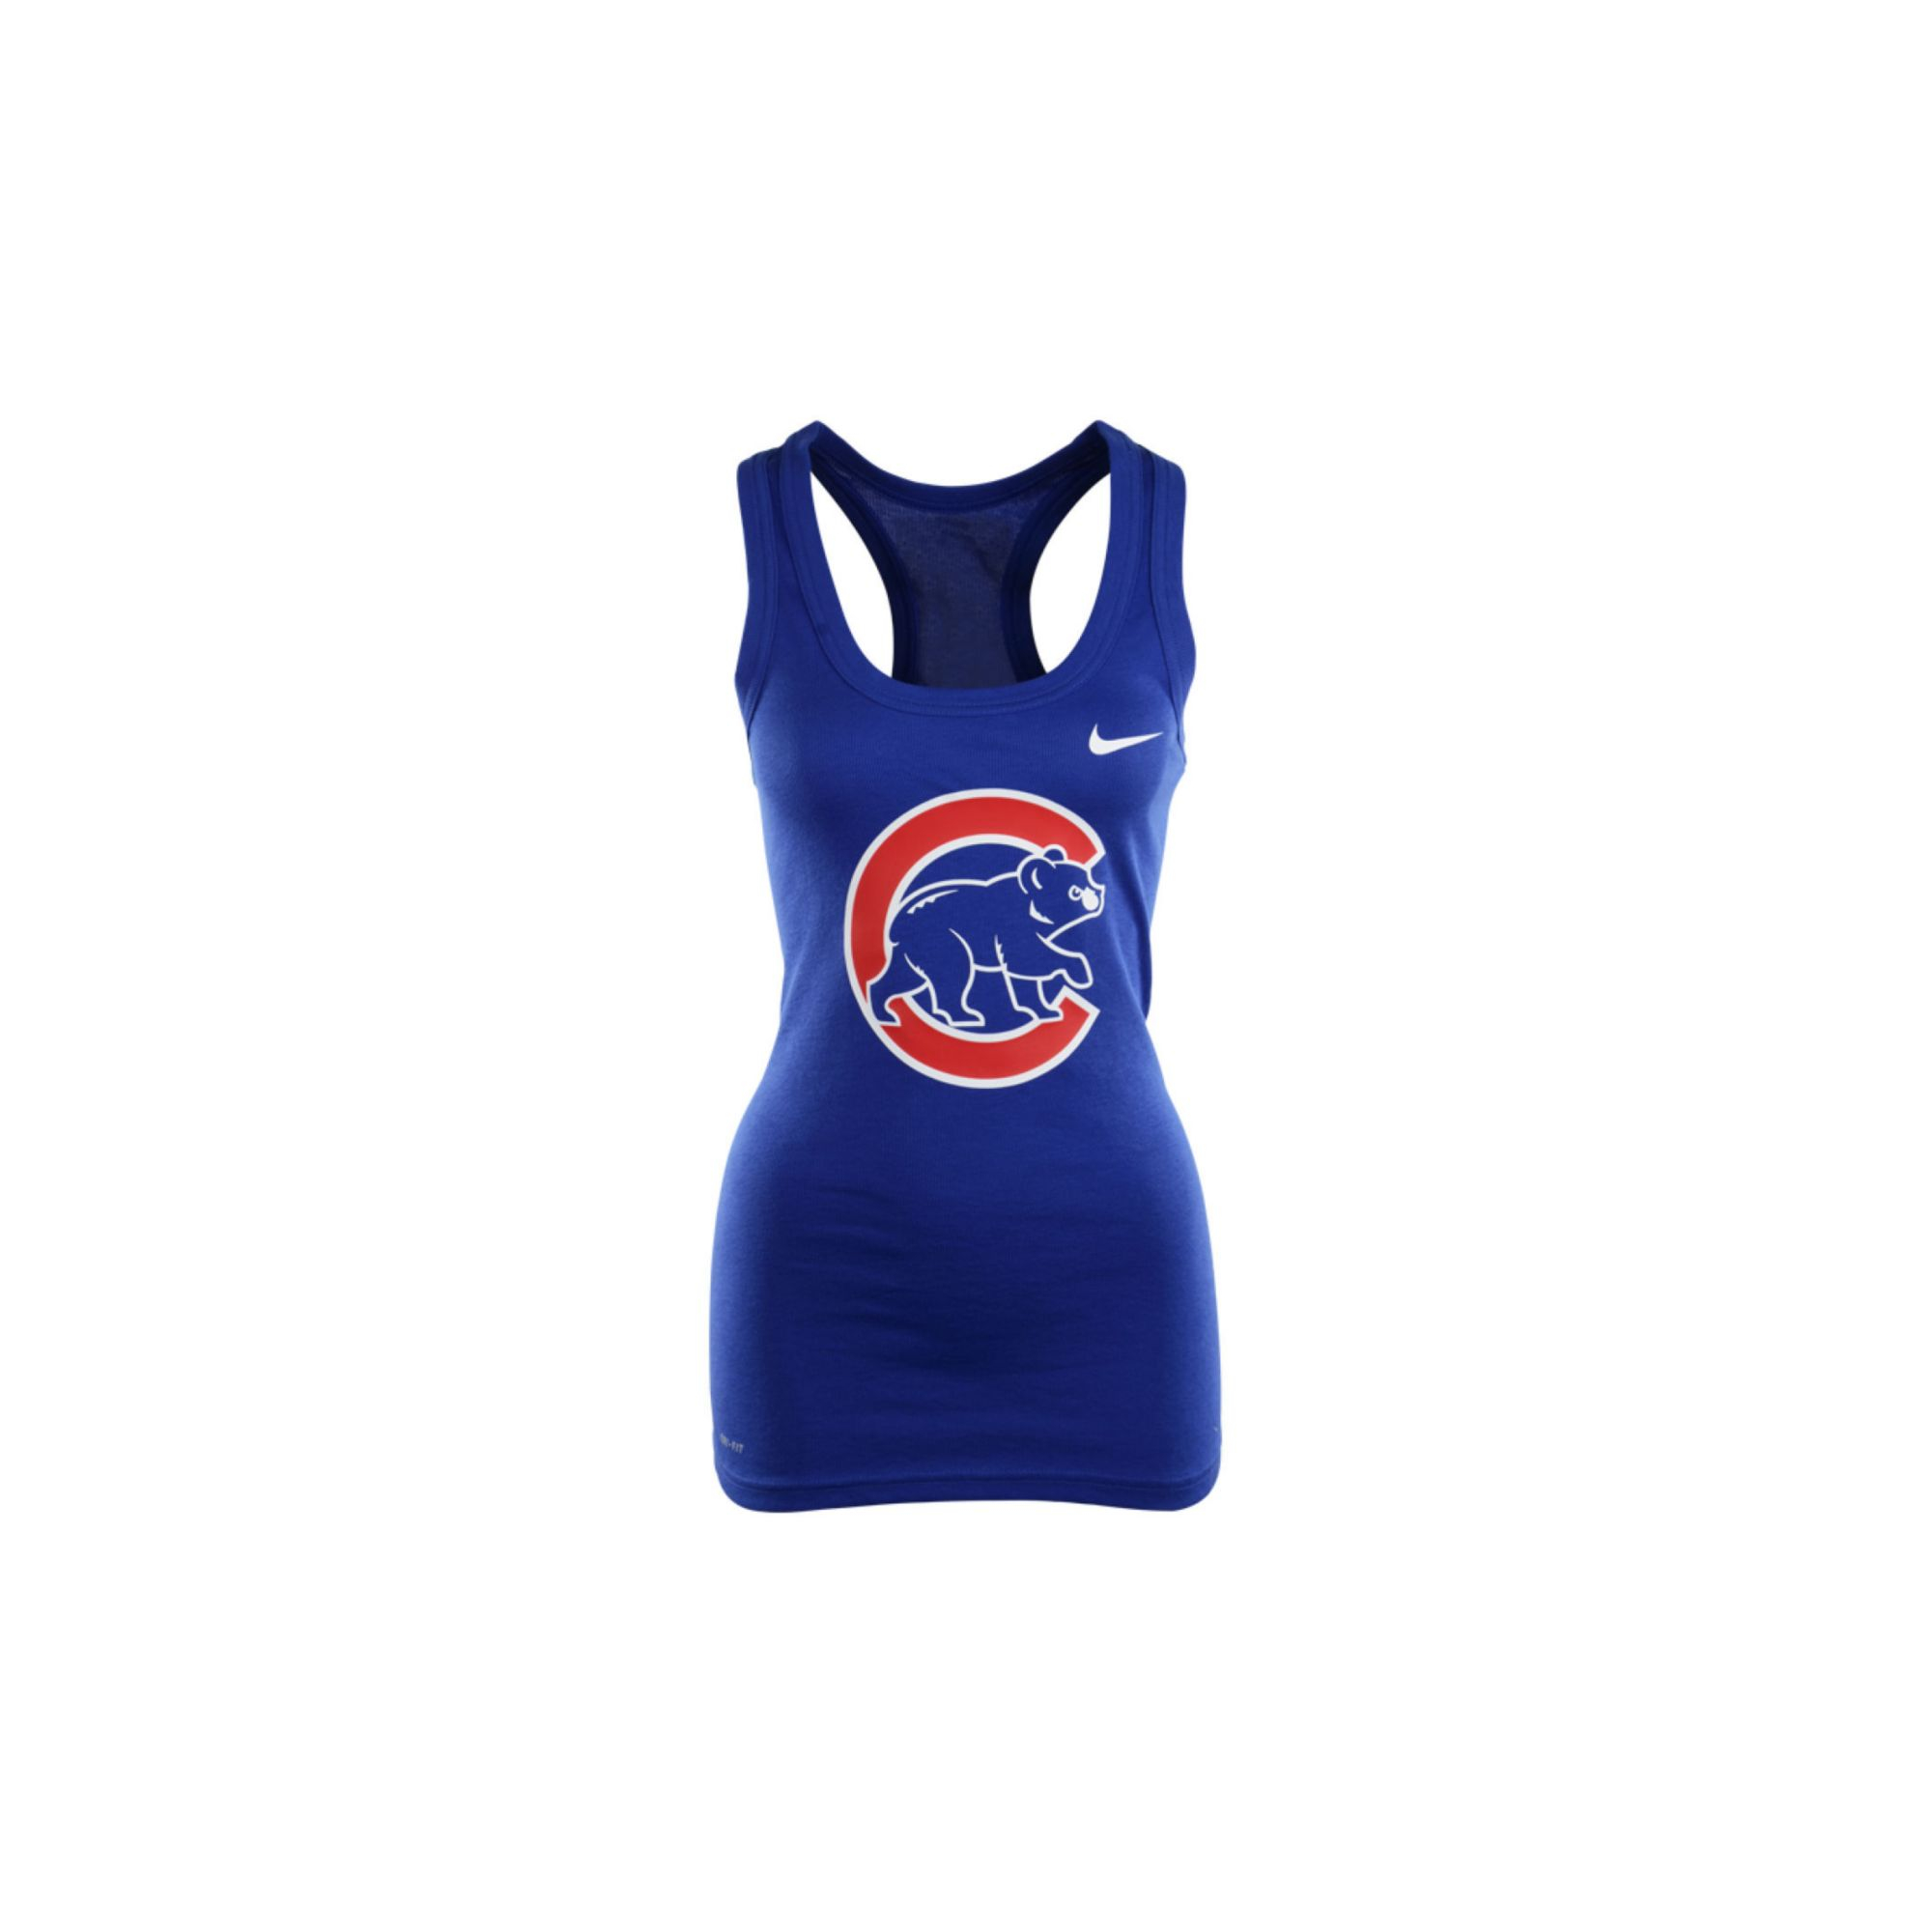 super popular 9e53d 67b99 Nike Blue Womens Chicago Cubs Drifit Racerback Tank Top